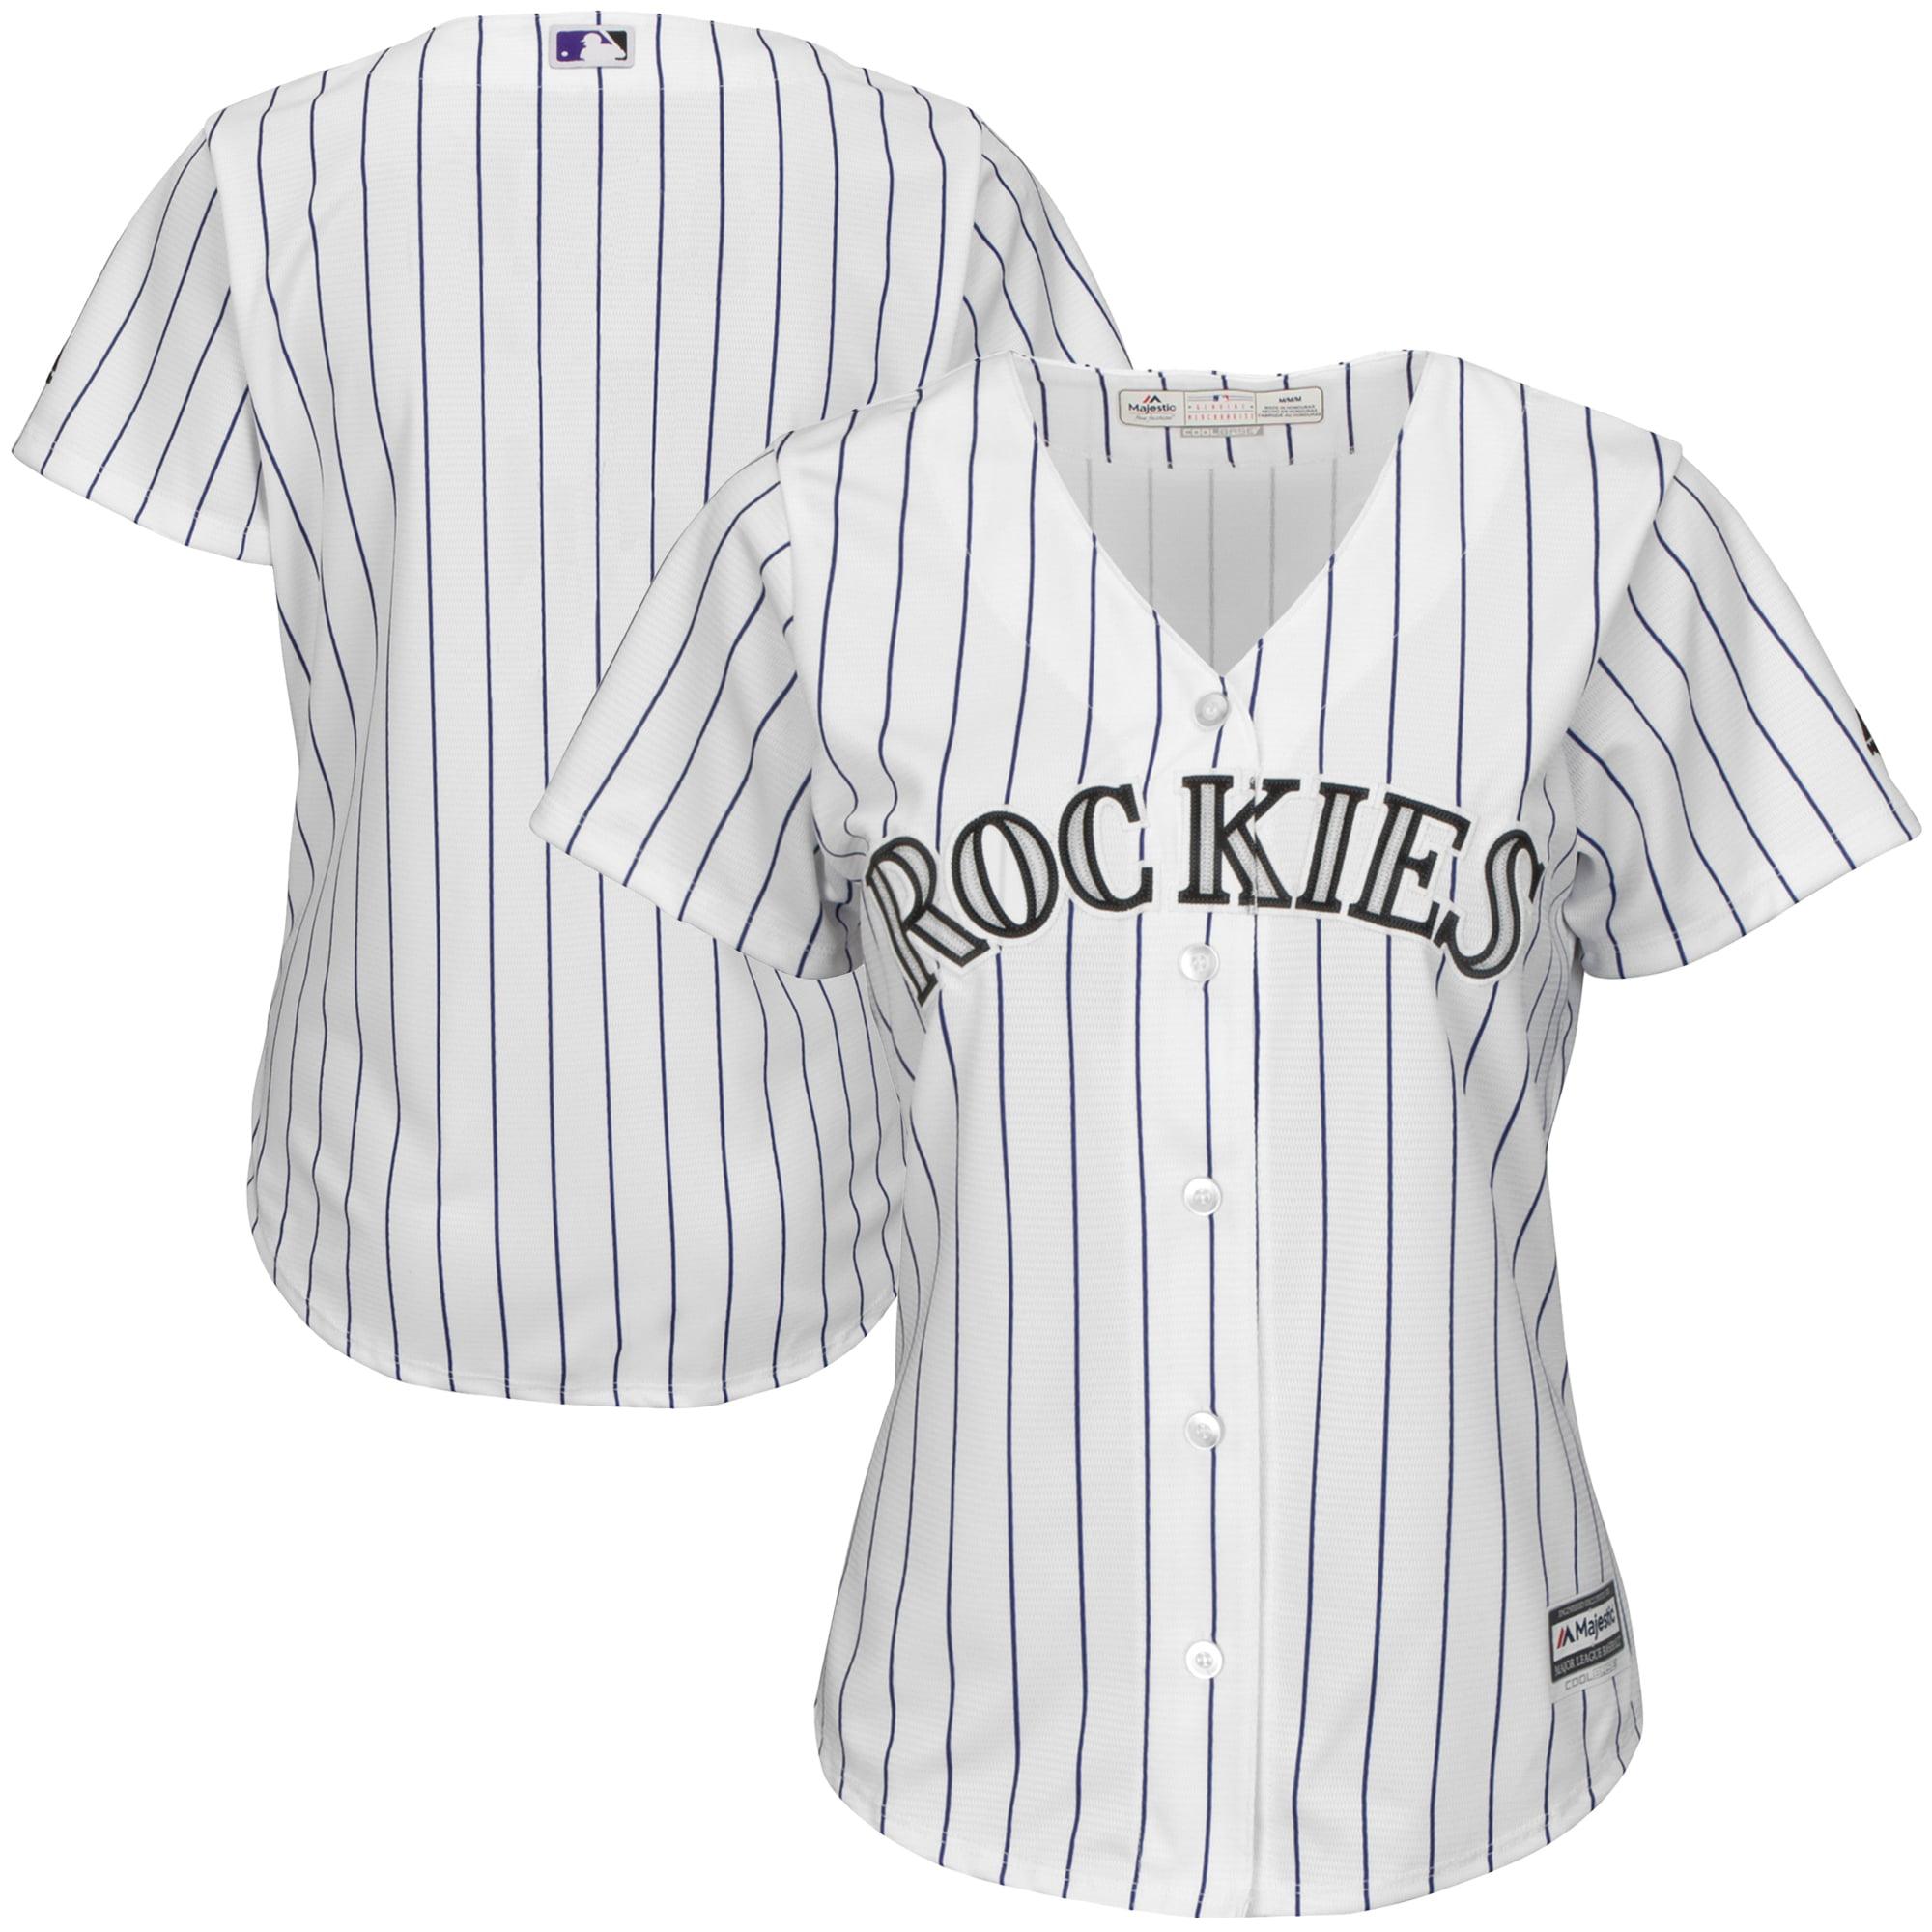 Colorado Rockies Majestic Women's Home Cool Base Team Jersey - White/Purple